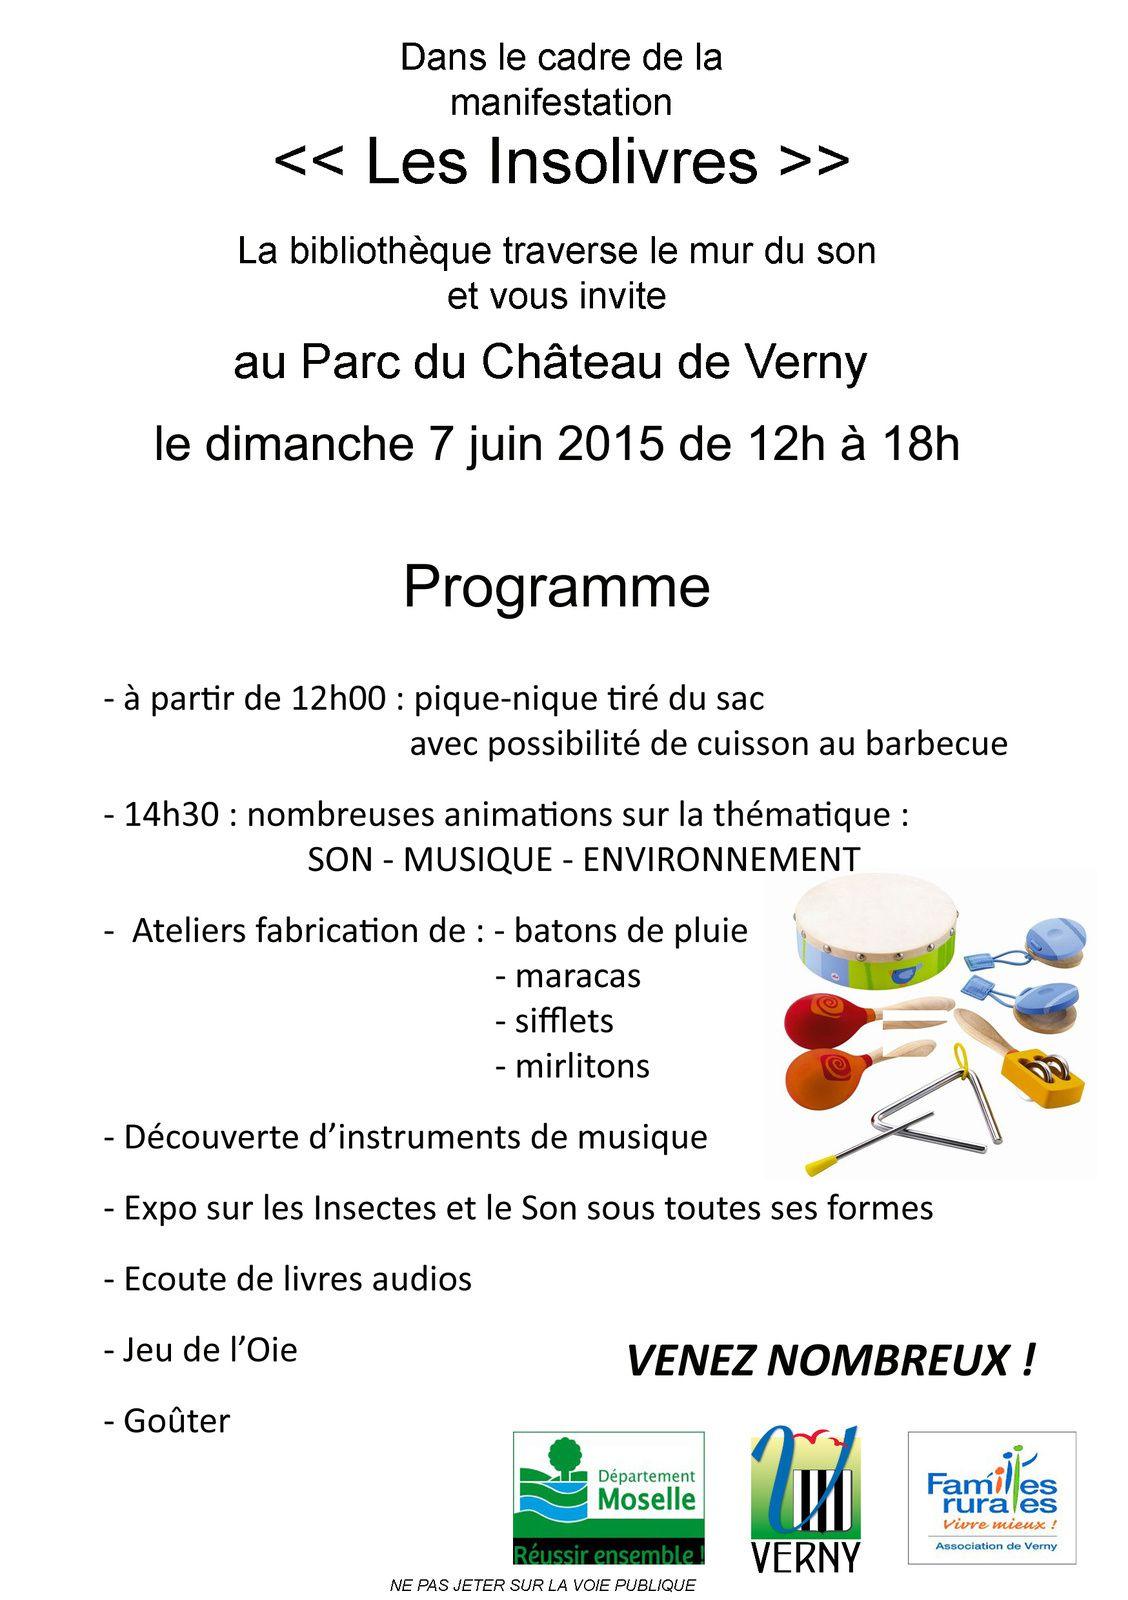 Verny Insolivres dimanche 7 juin 2015